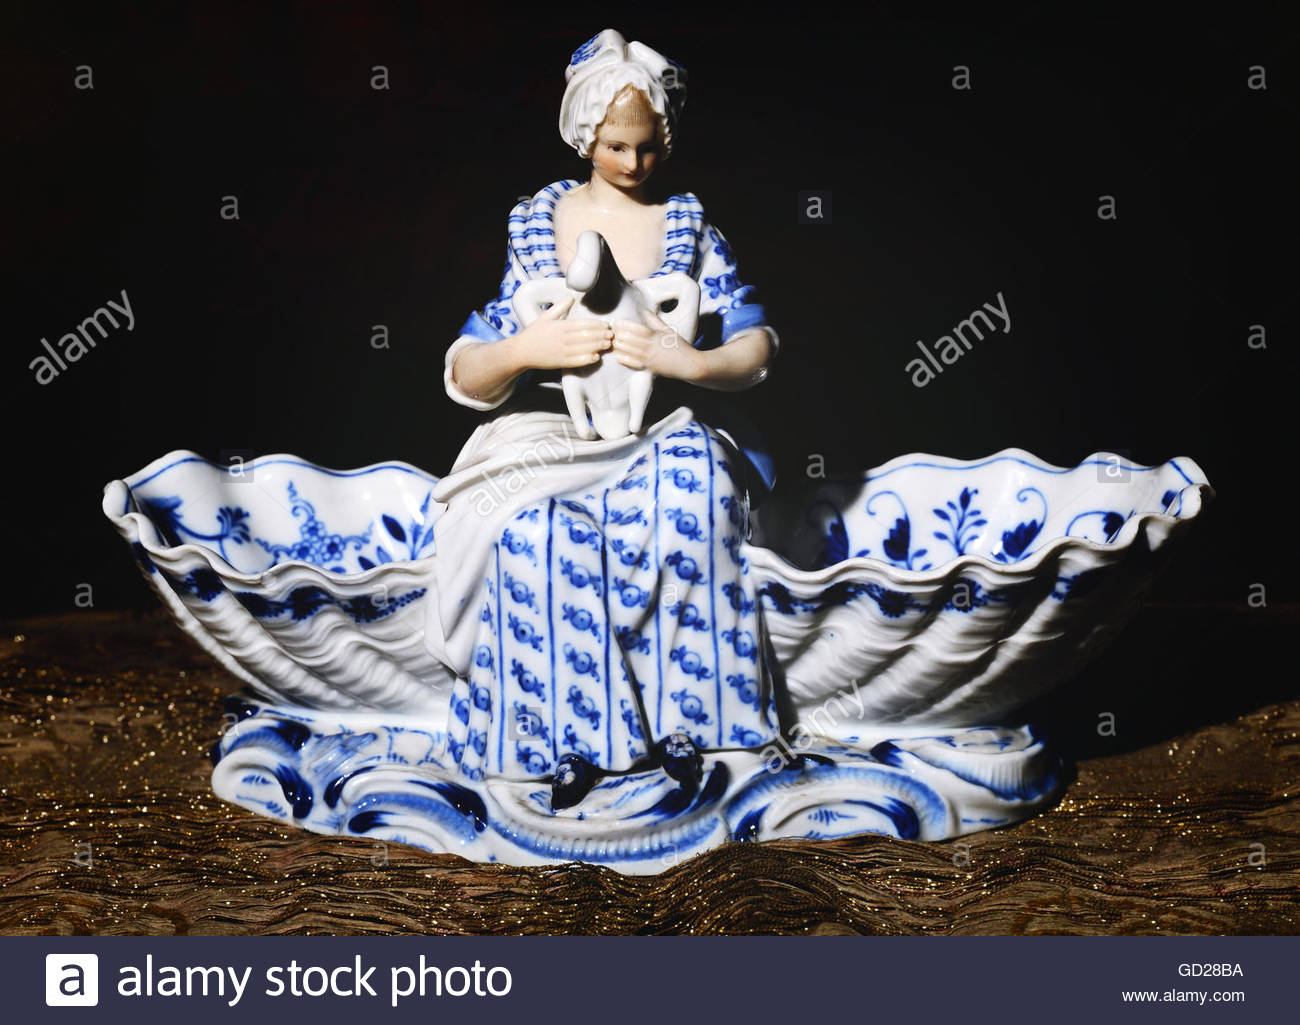 Meissen Porcelain Manufactory Stockfotos & Meissen